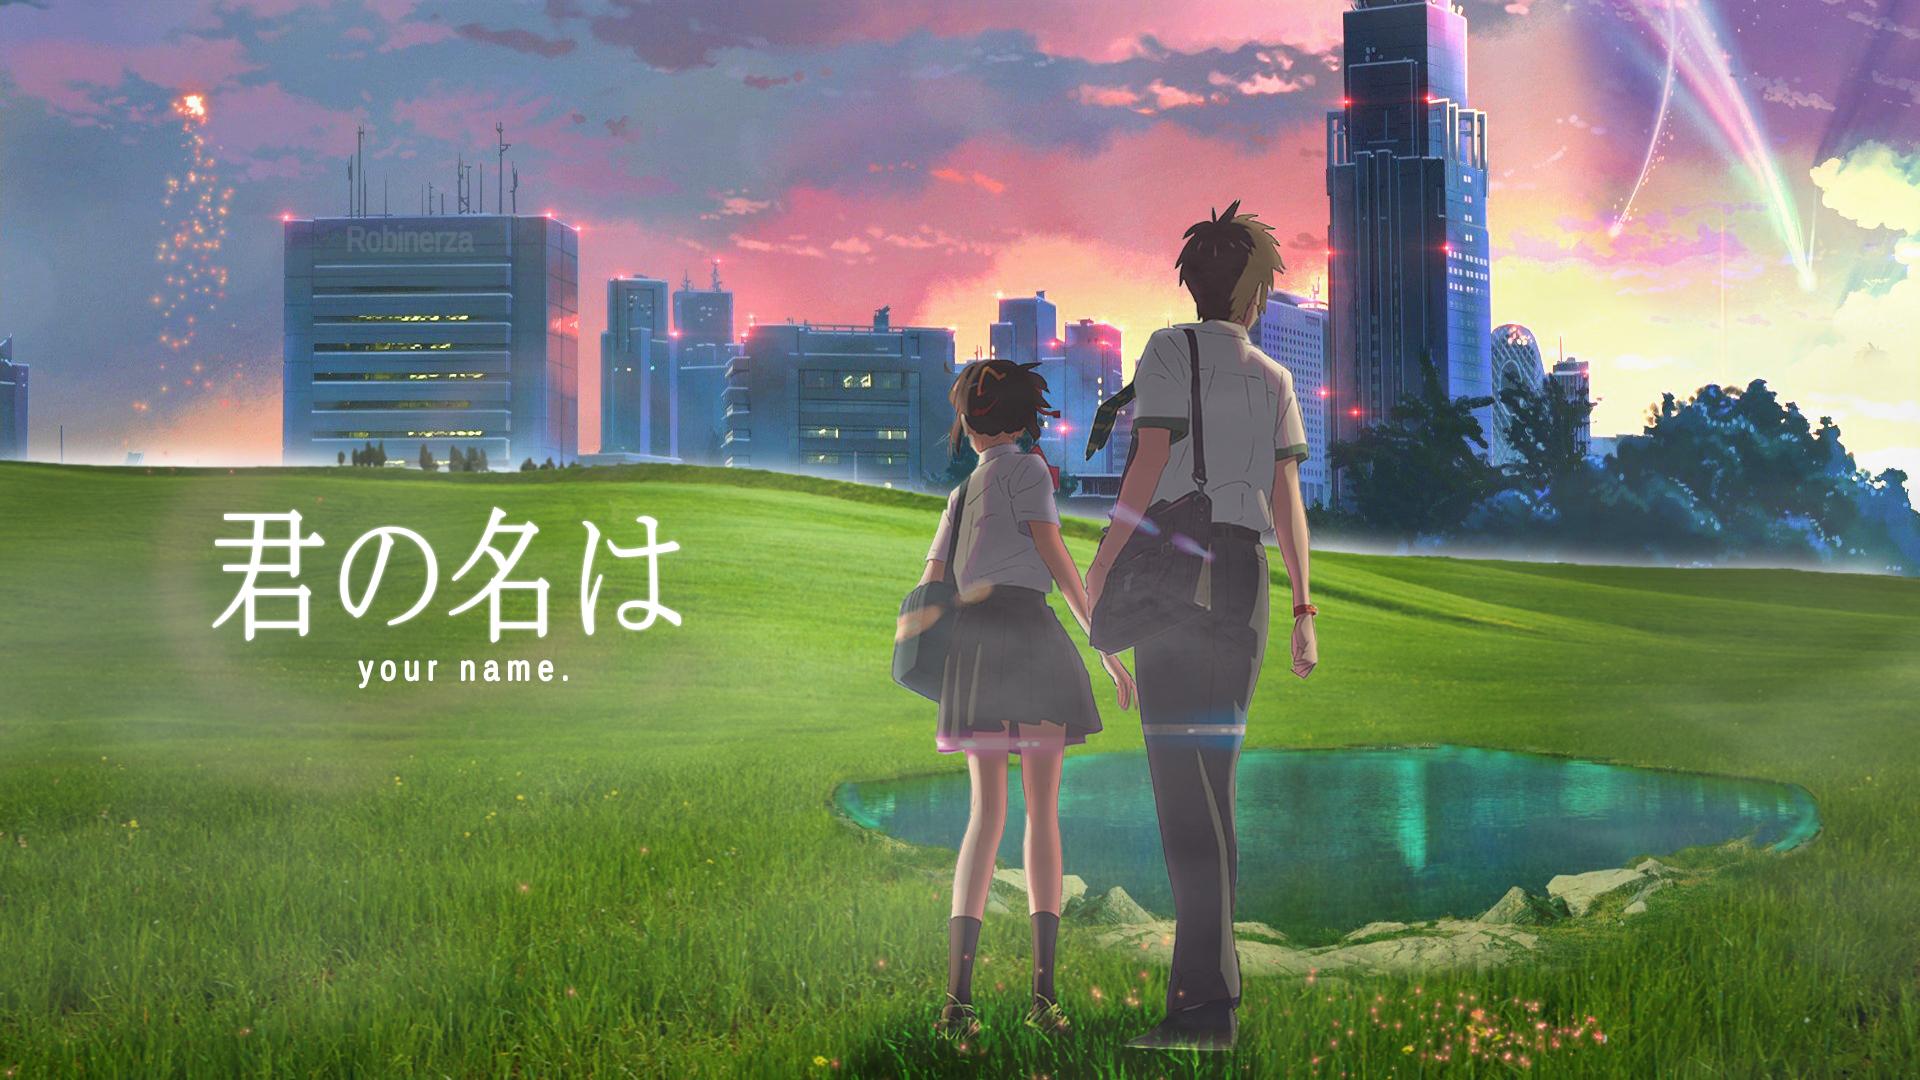 Best Anime Kimi No Na Wa Wallpaper Anime City Gif 300057